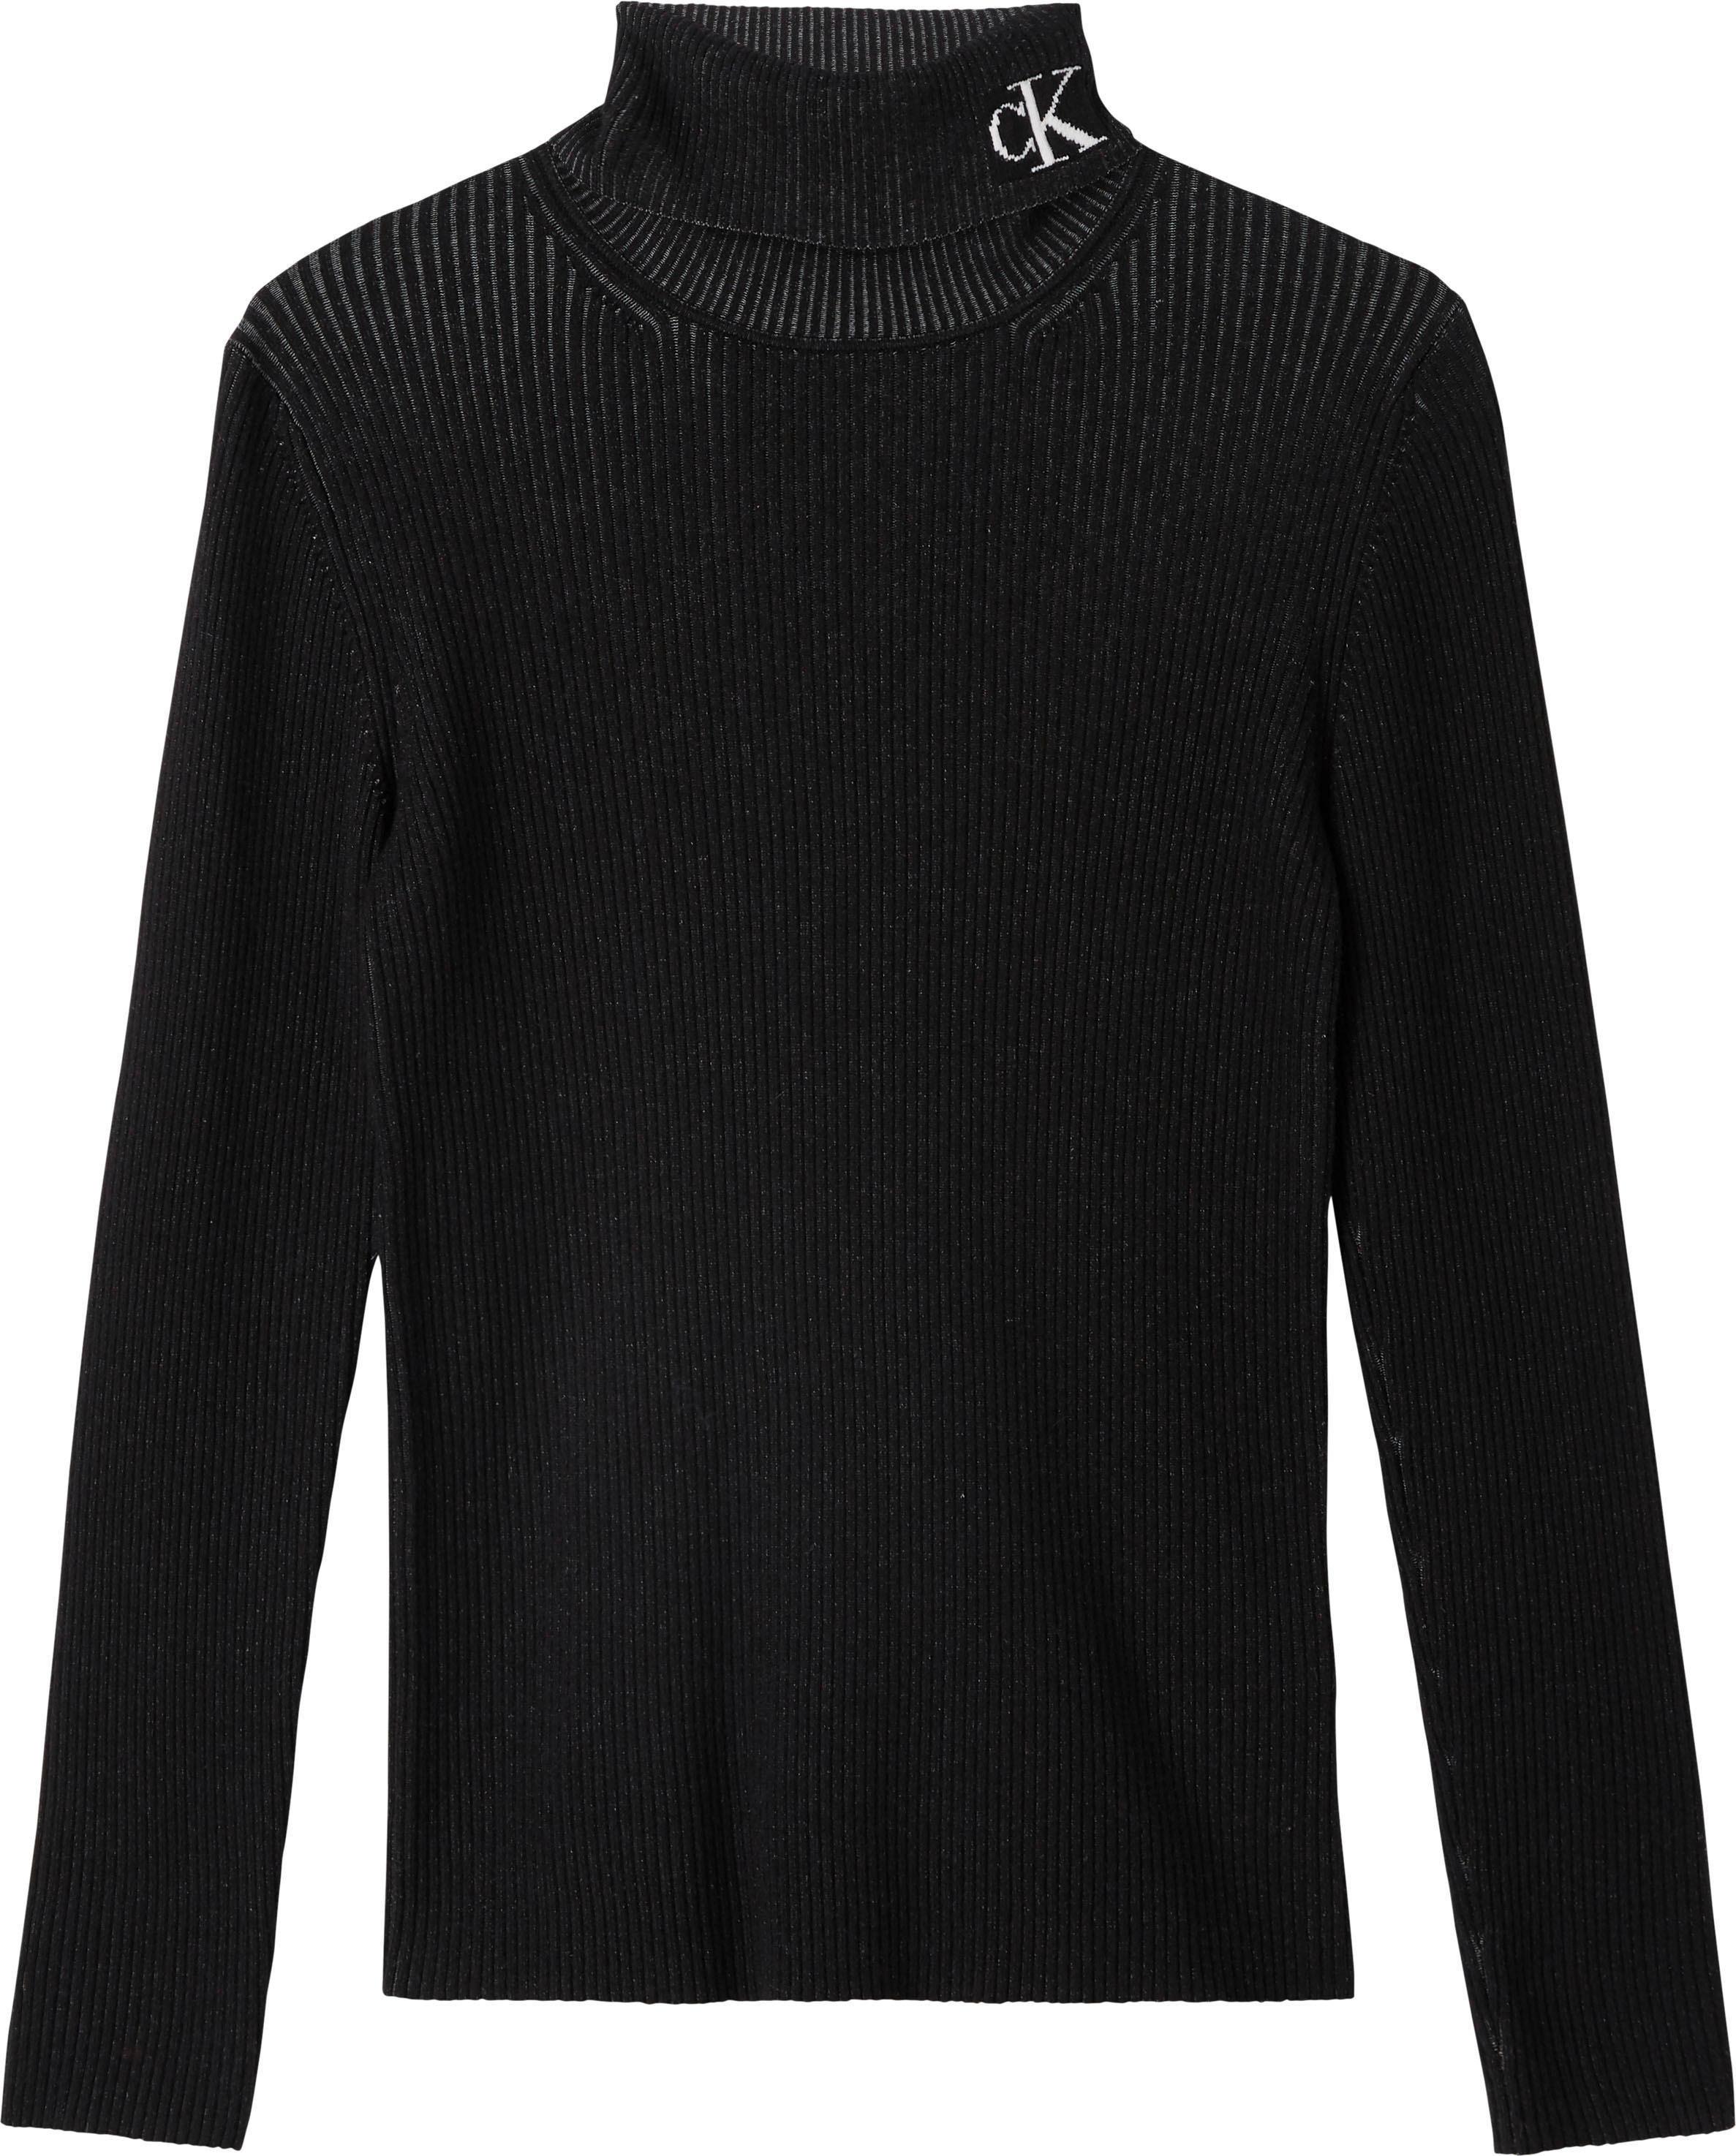 Calvin Klein coltrui »RIB ROLL NECK WITH CK« nu online kopen bij OTTO